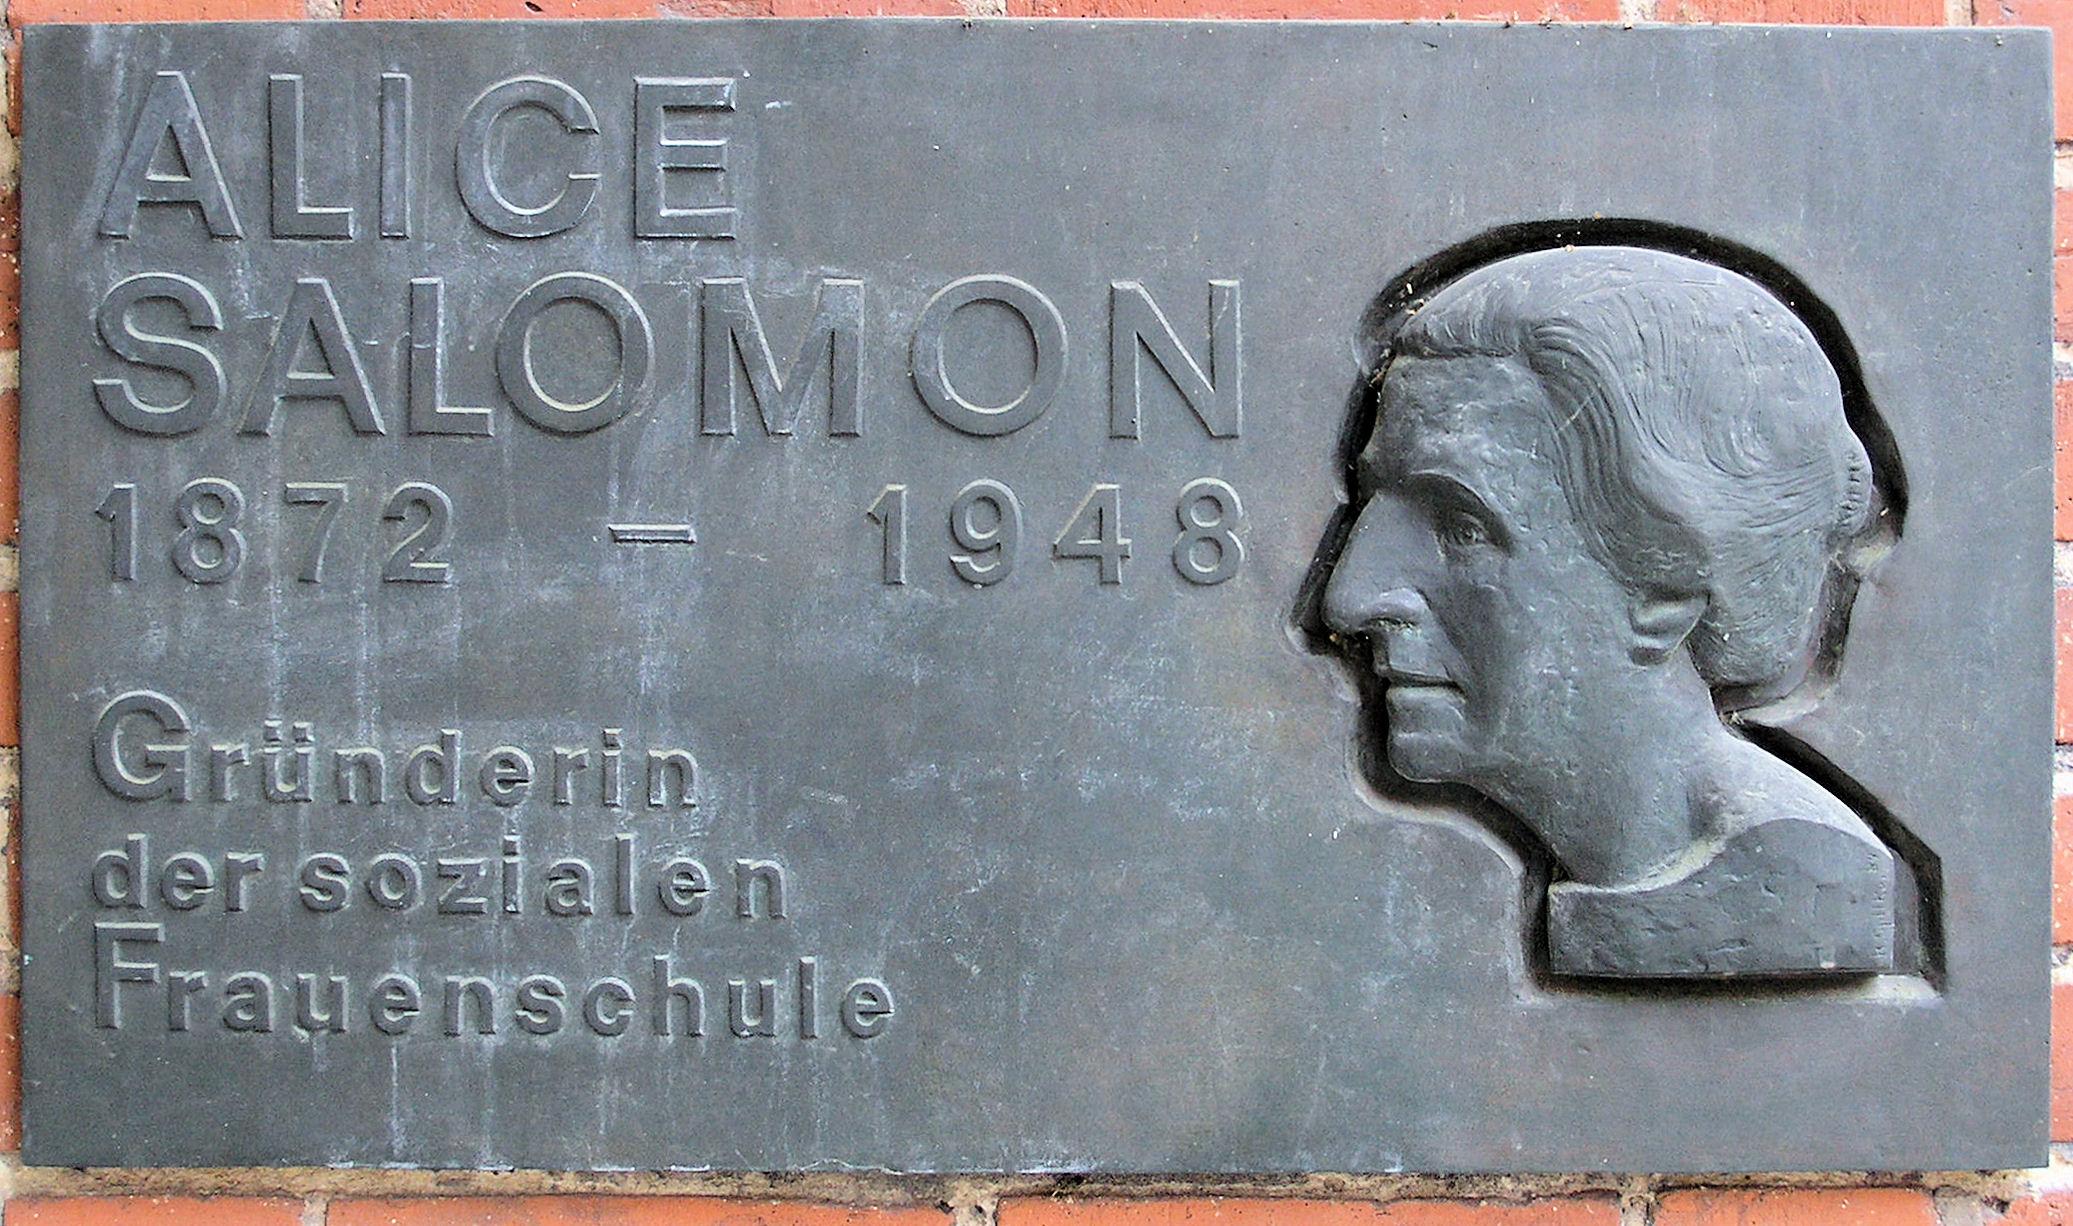 File:Diss.Alice.Salomon.JPG Wikimedia Commons